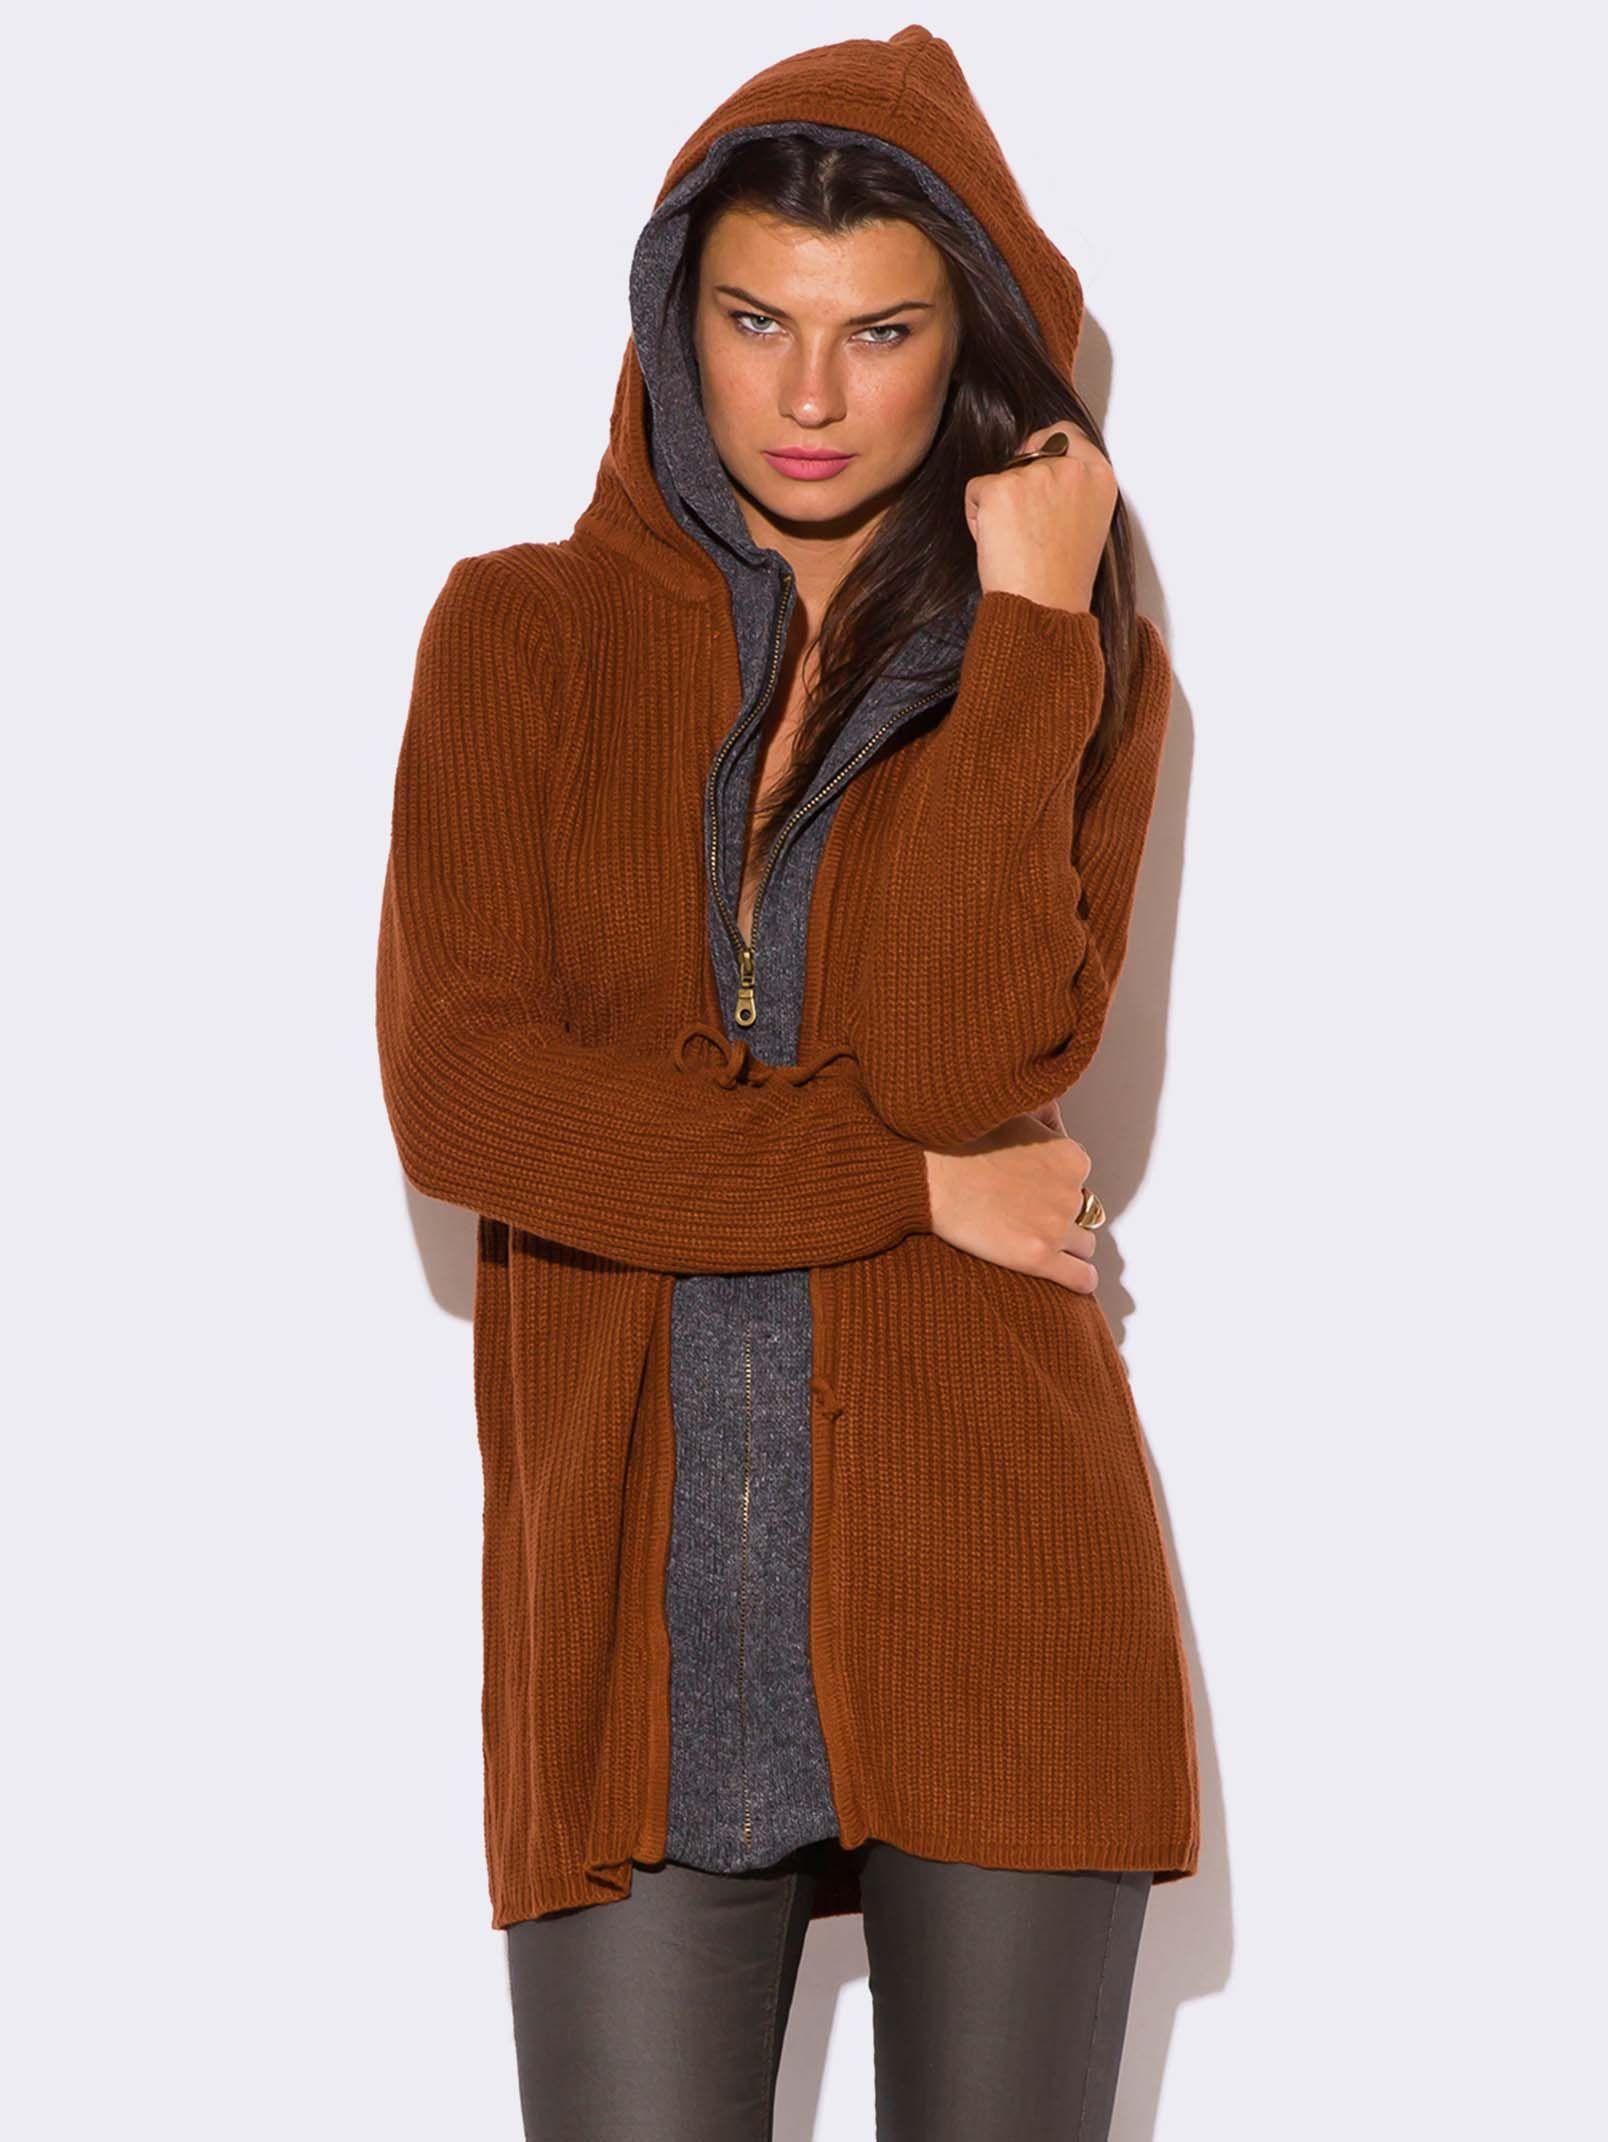 RUST BROWN ZIP UP HOODED SWEATER | Things to Wear | Pinterest ...